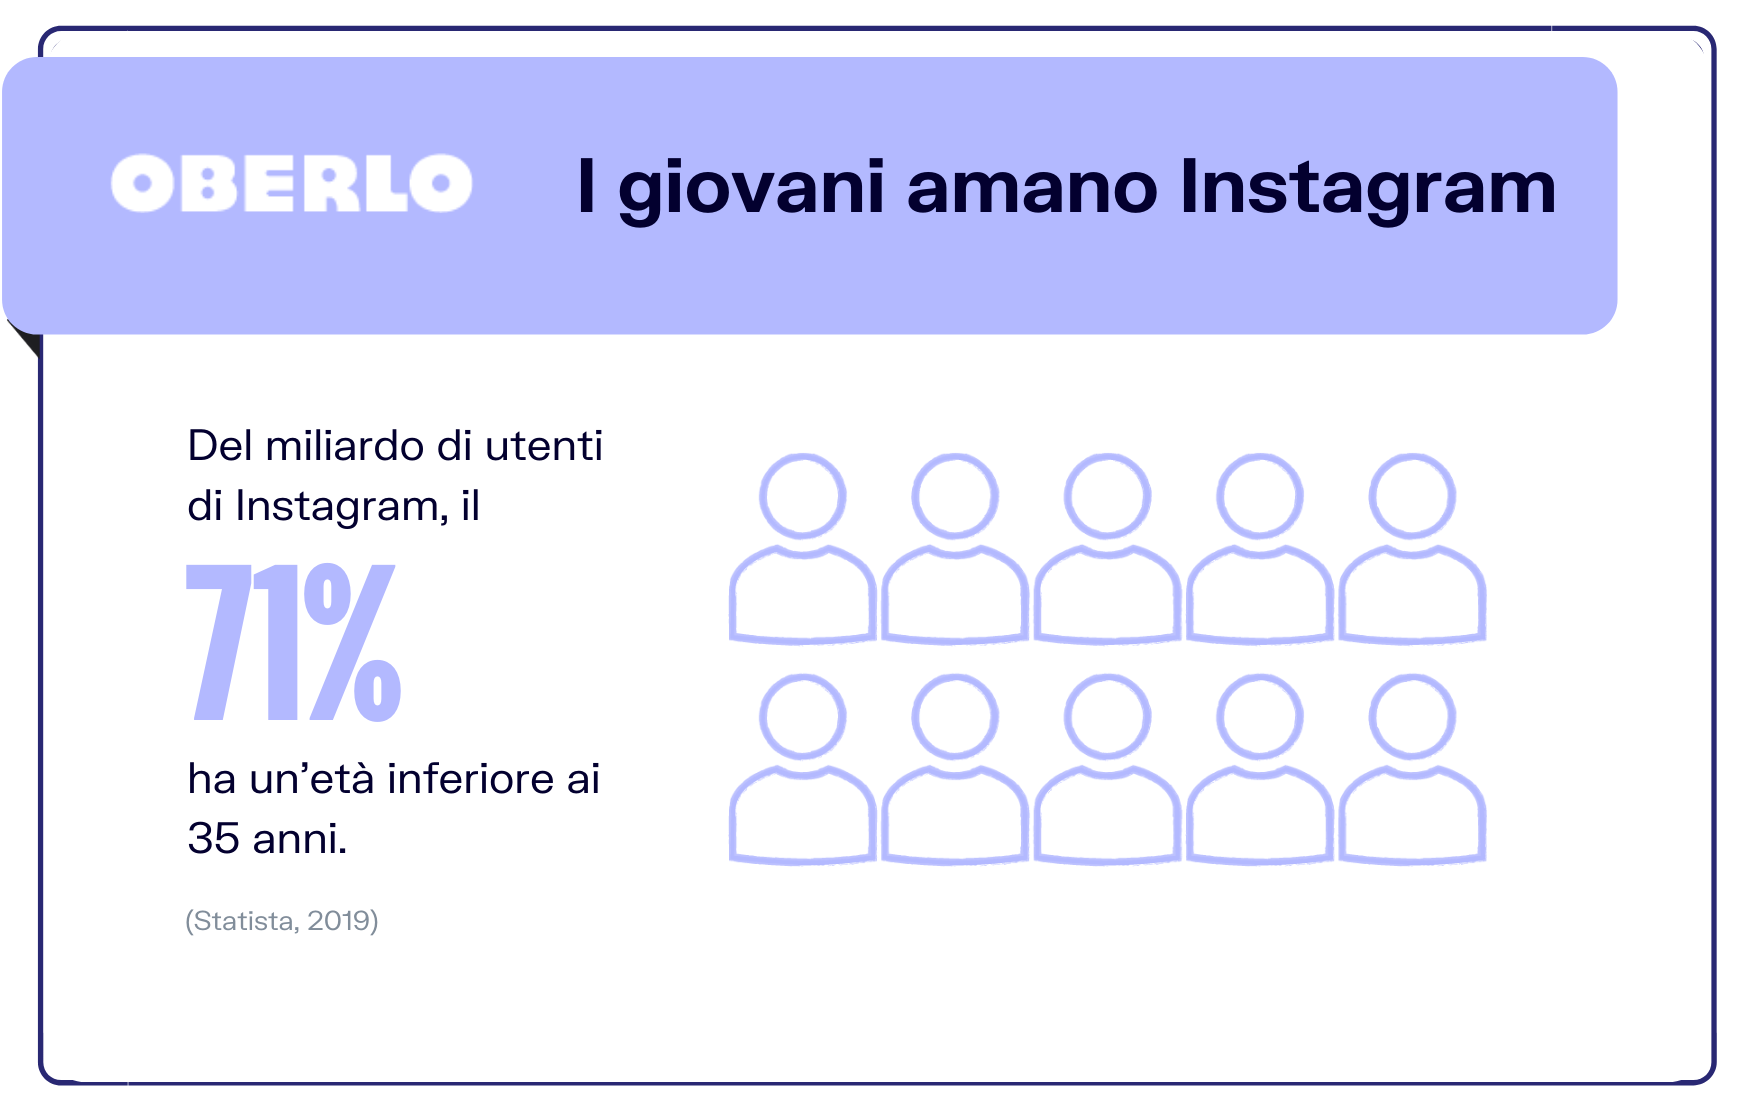 statistiche instagram giovani